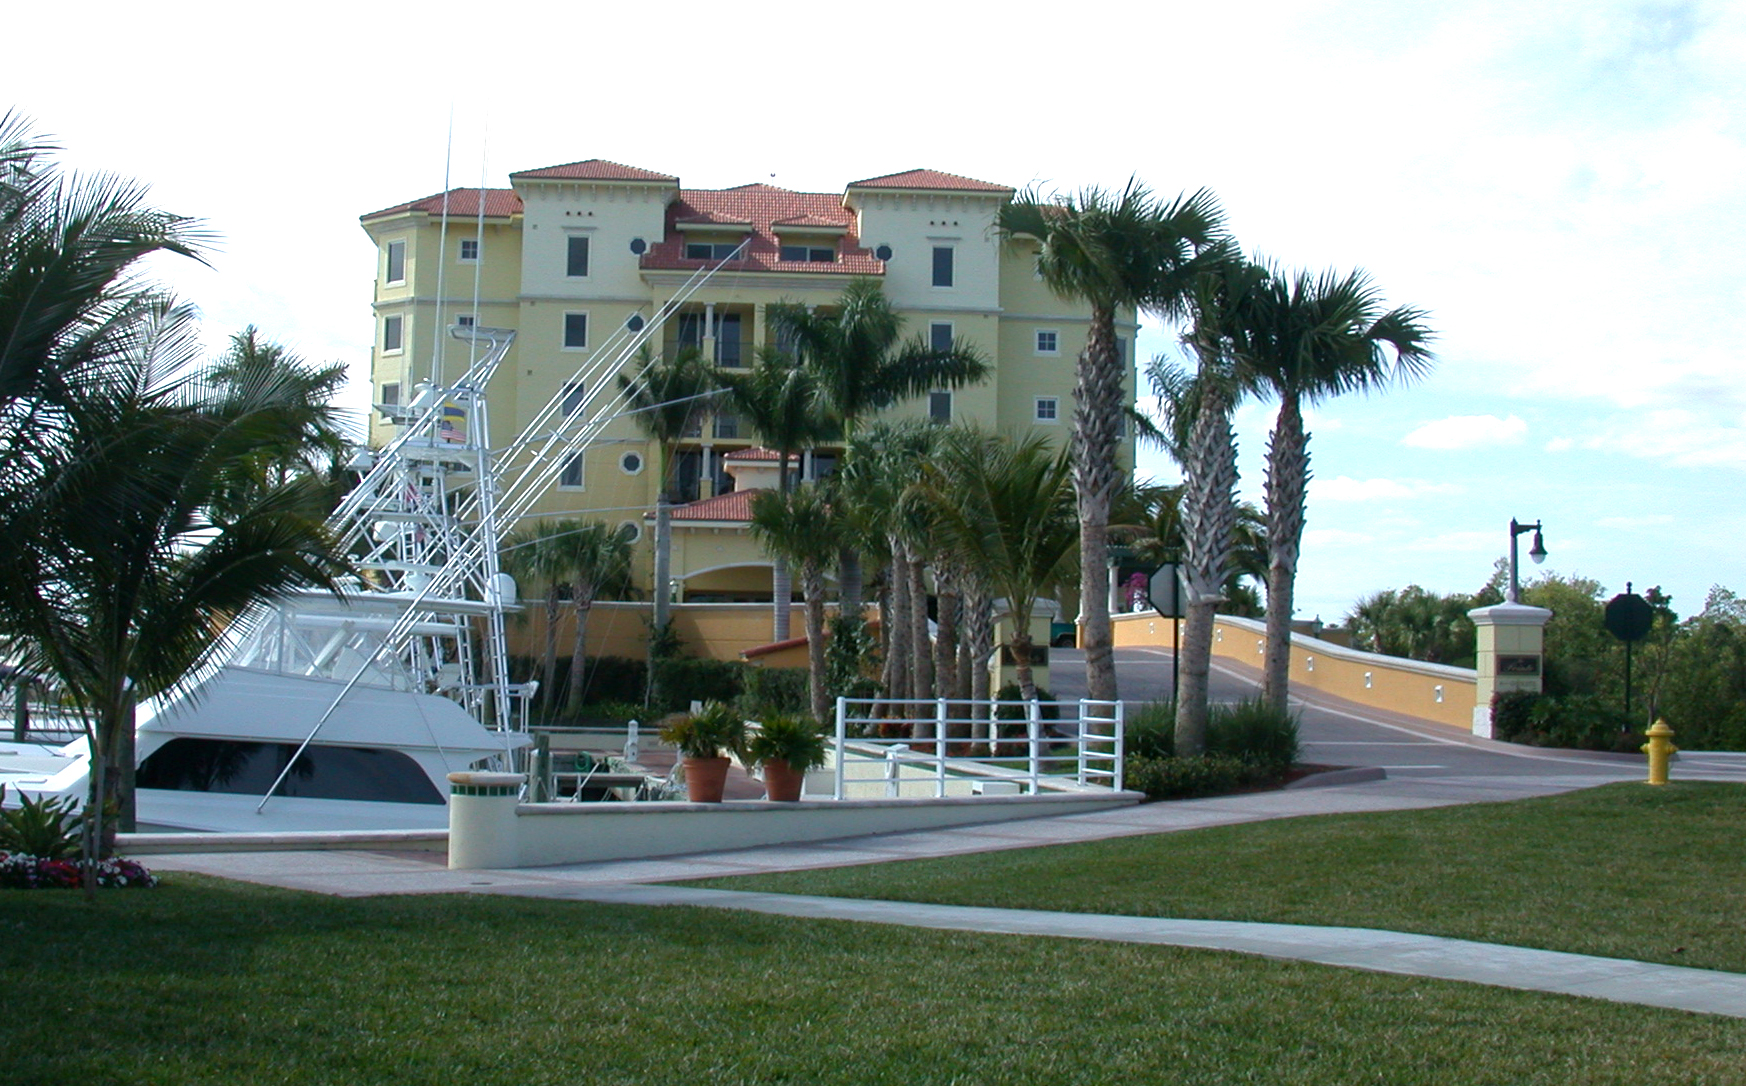 Jupiter Yacht Club Florida Pointe Building.JPG